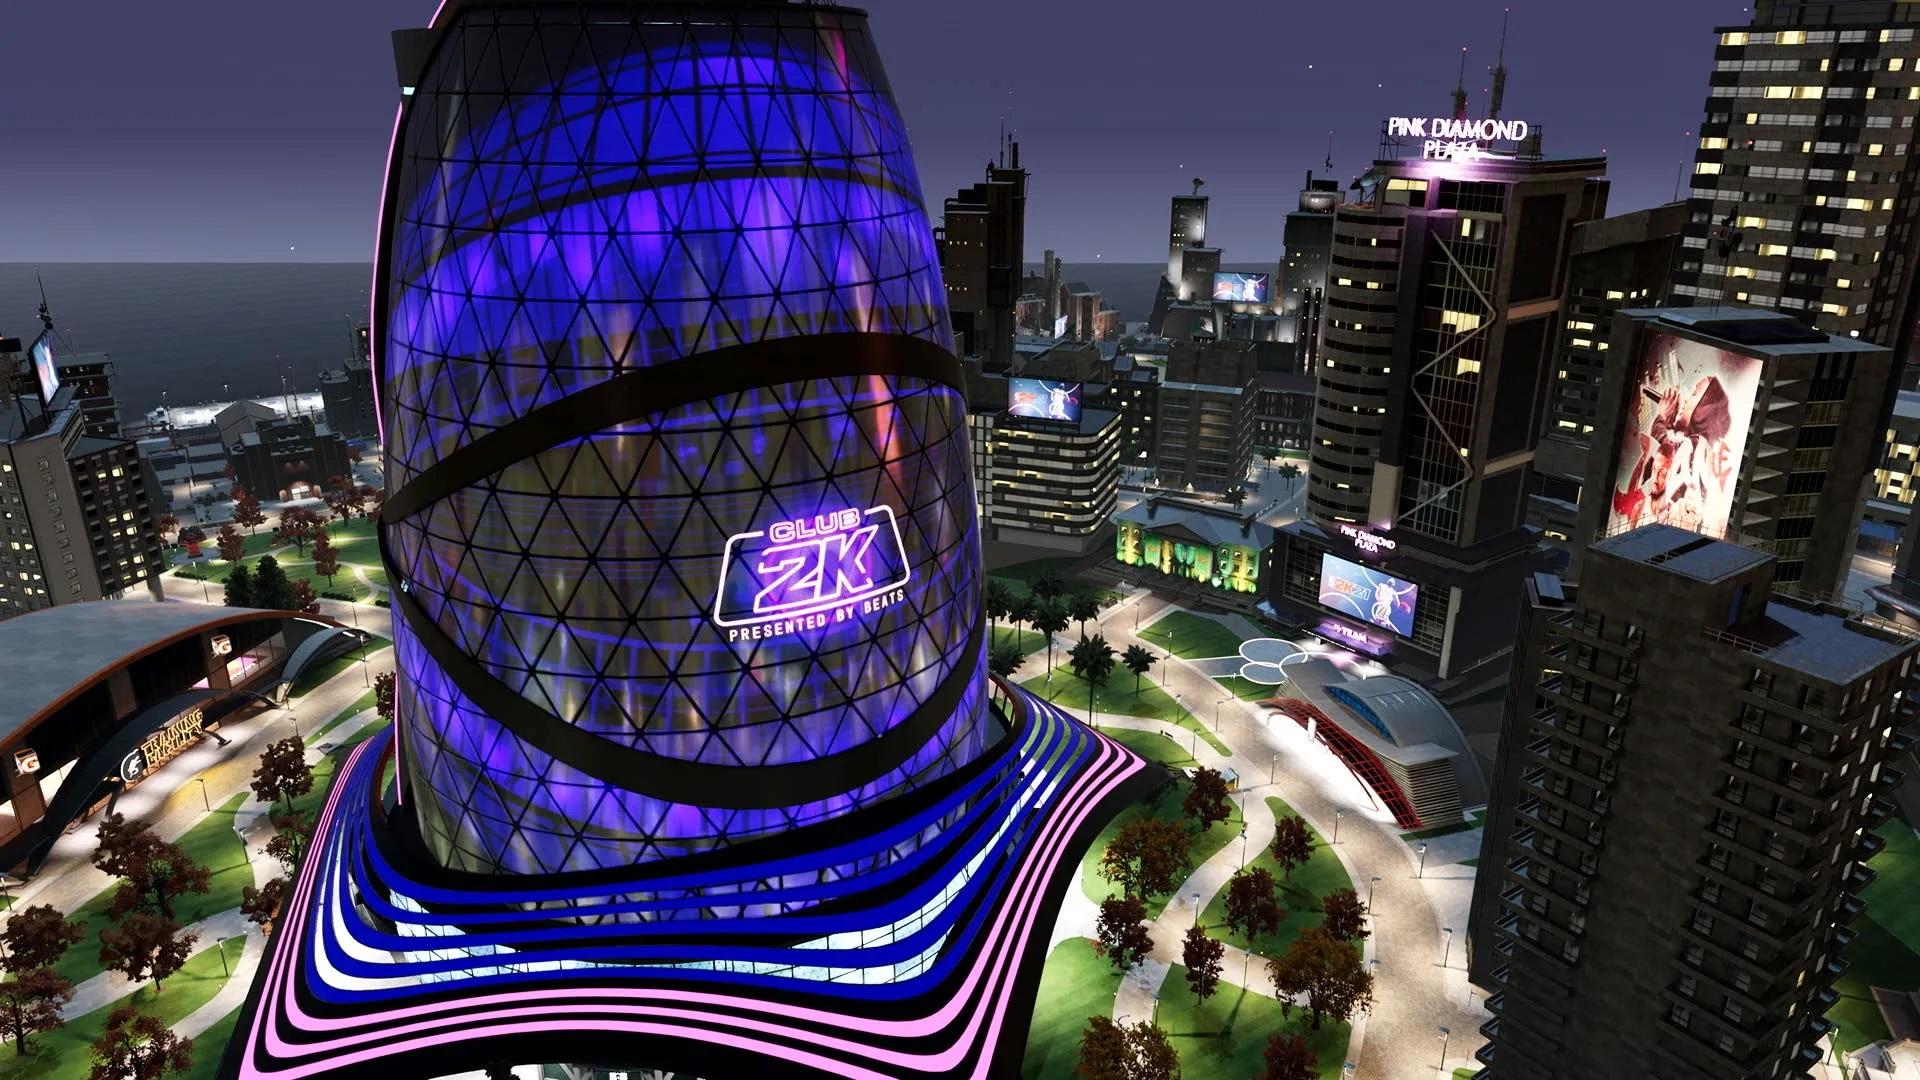 National Basketball Association 2K21 Neighborhood mode is transformed into a city for next-gen